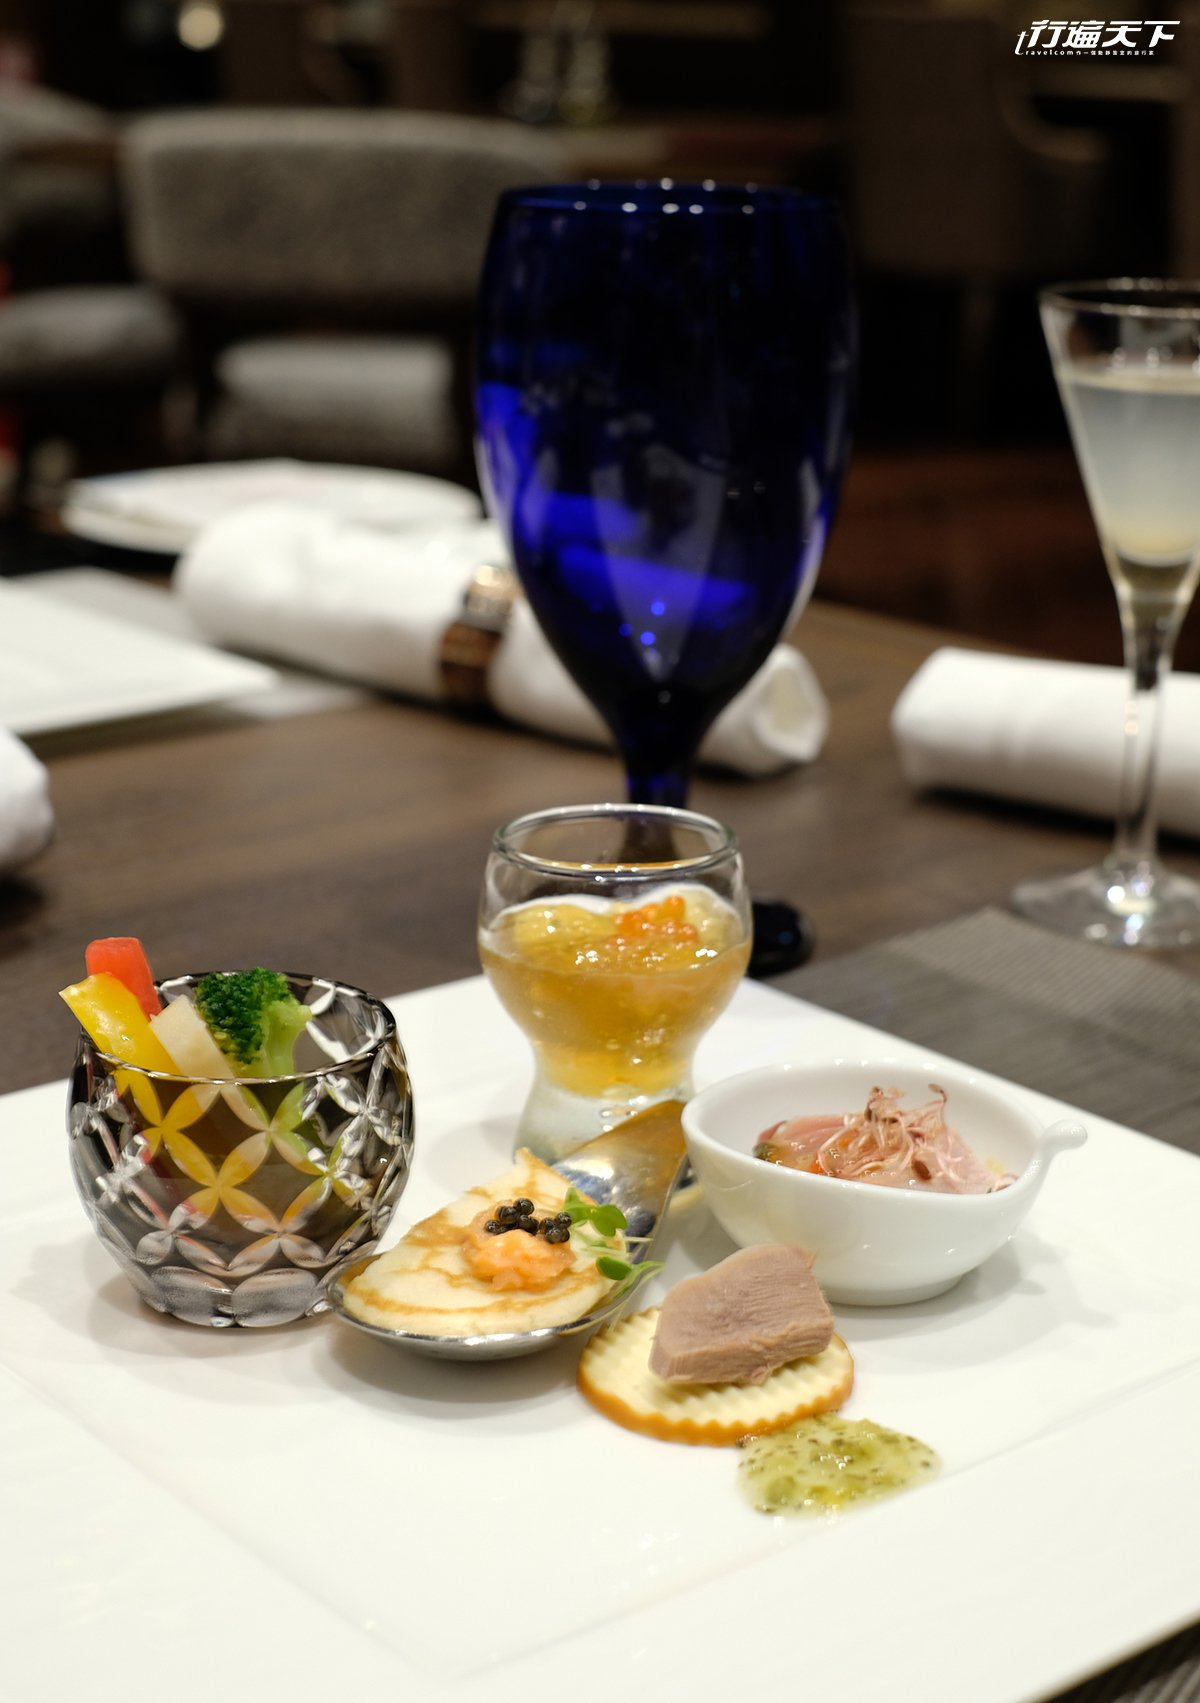 「LA VISTA霧島HILLS」只使用當地當季食材烹調的食物最美味。